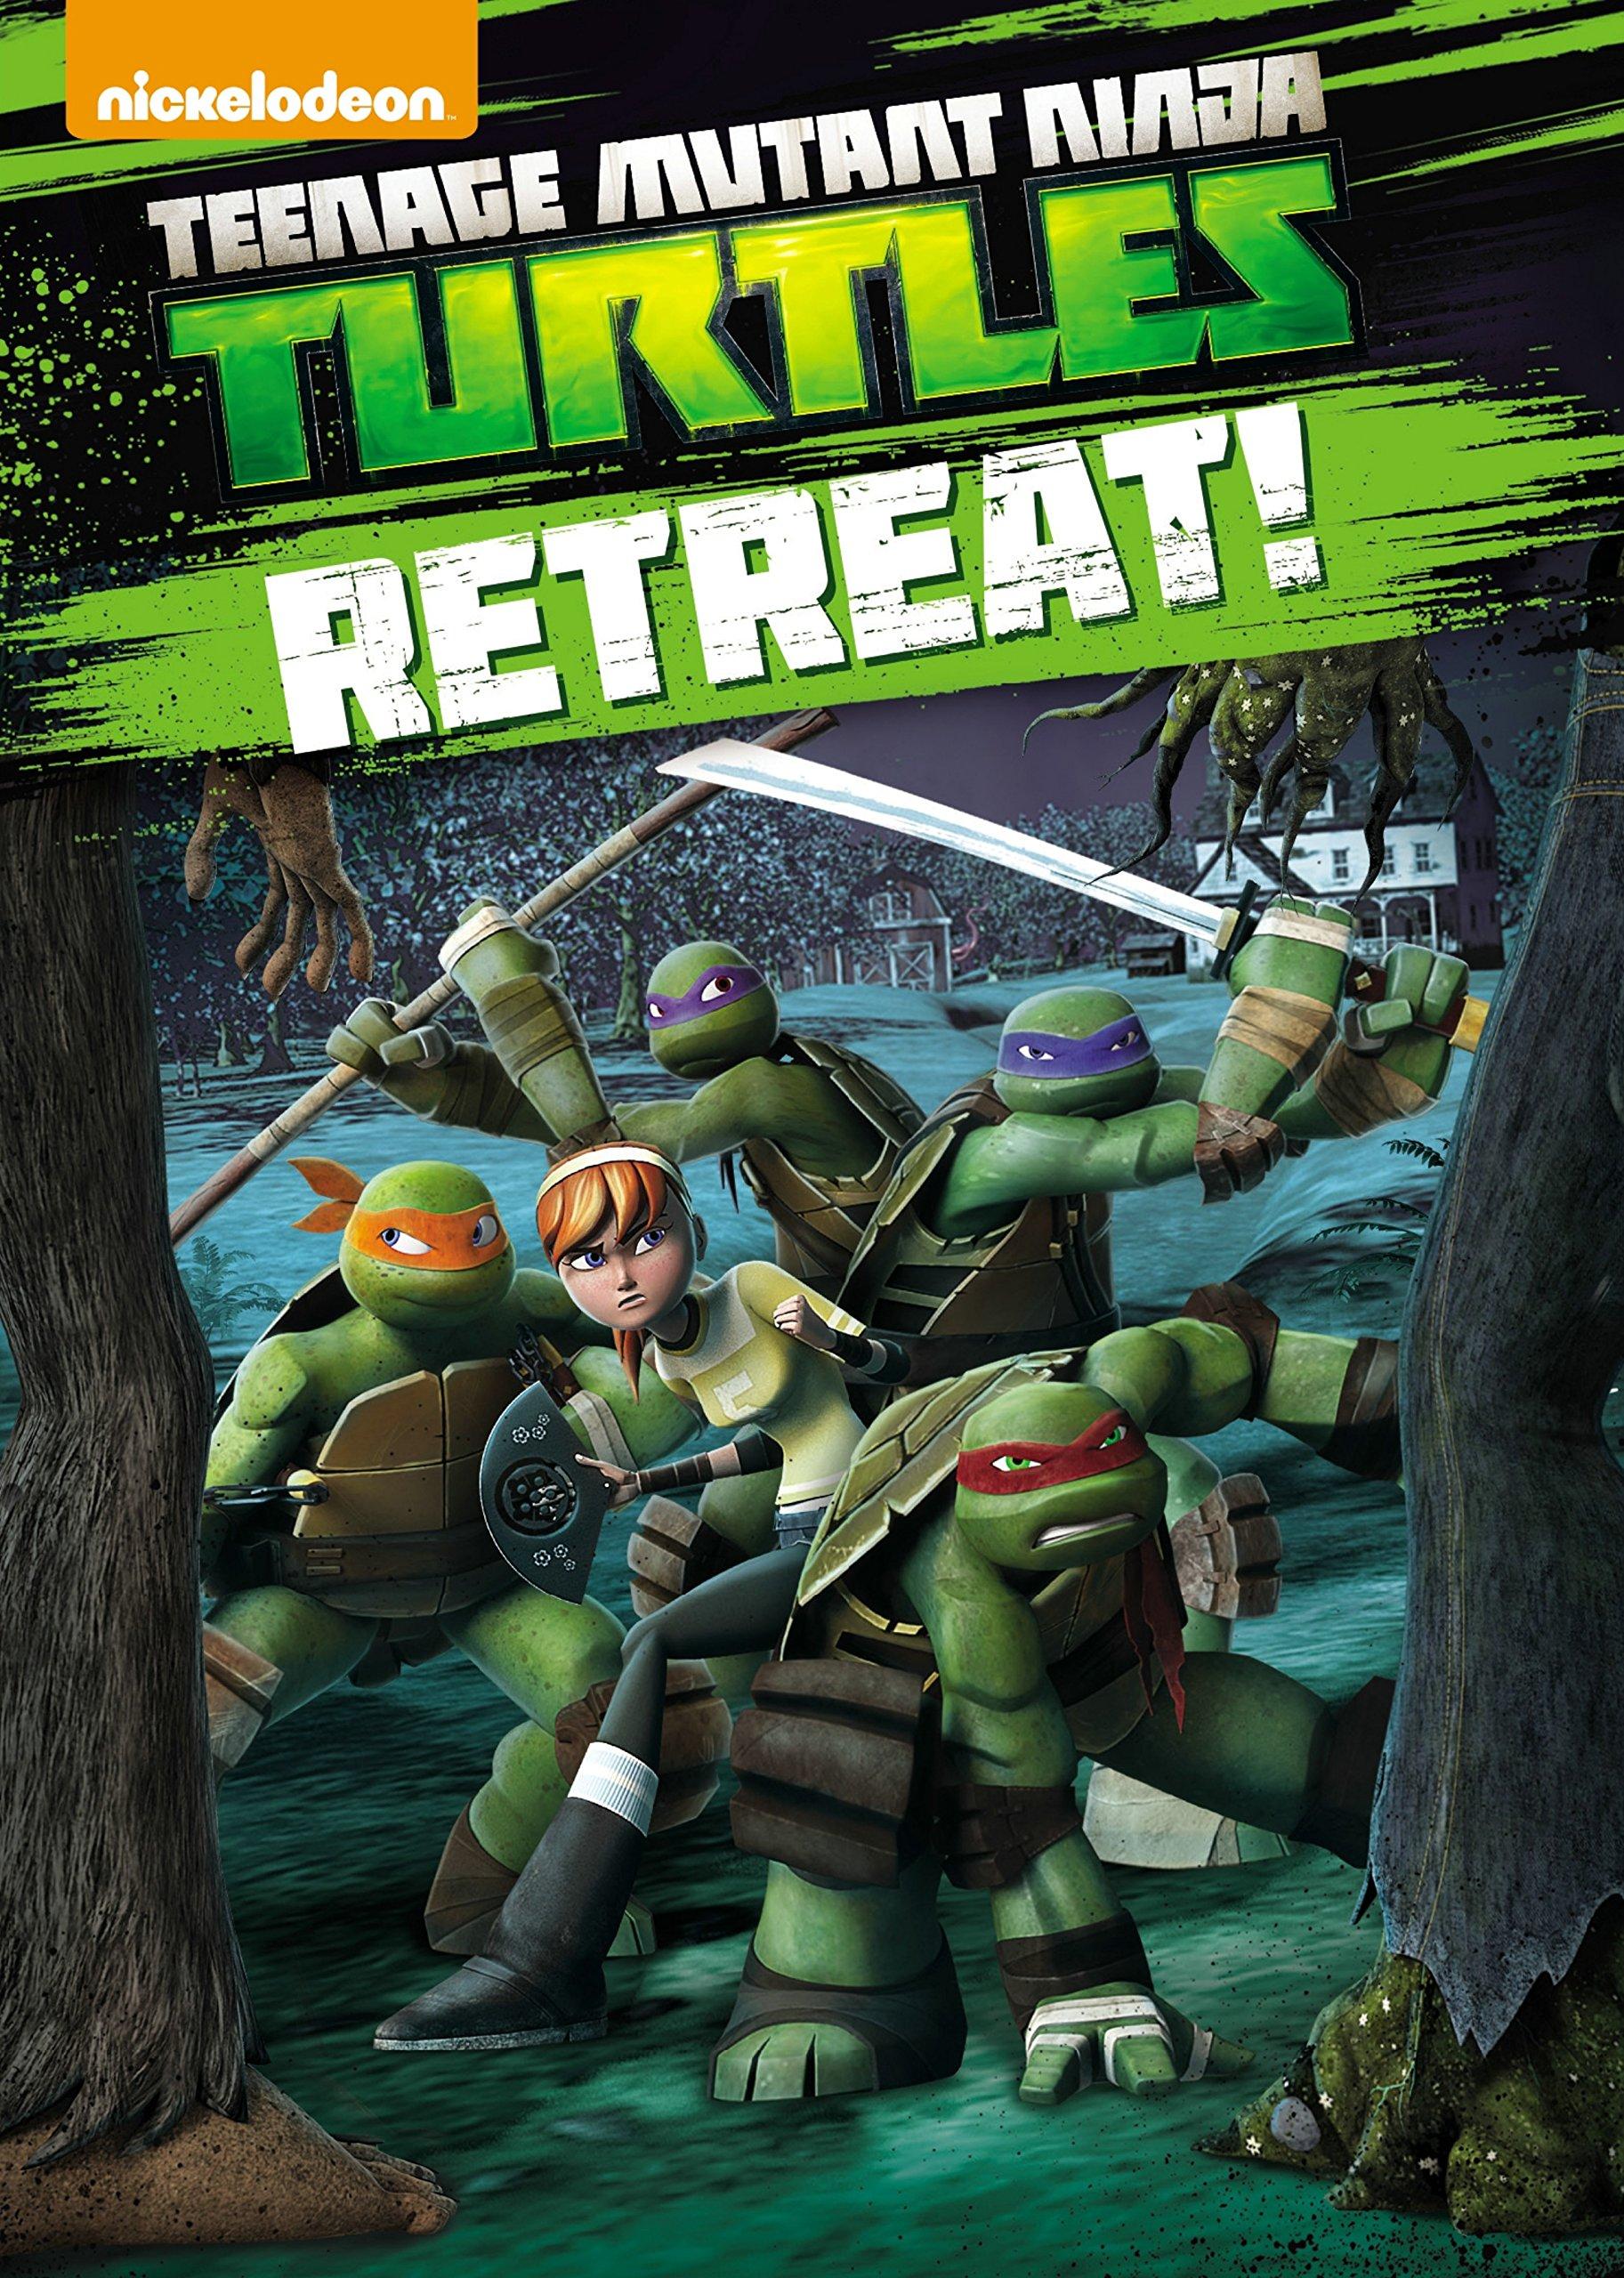 DVD : Teenage Mutant Ninja Turtles: Season 3 - Volume 1 (Dolby, Amaray Case, Widescreen, Sensormatic)